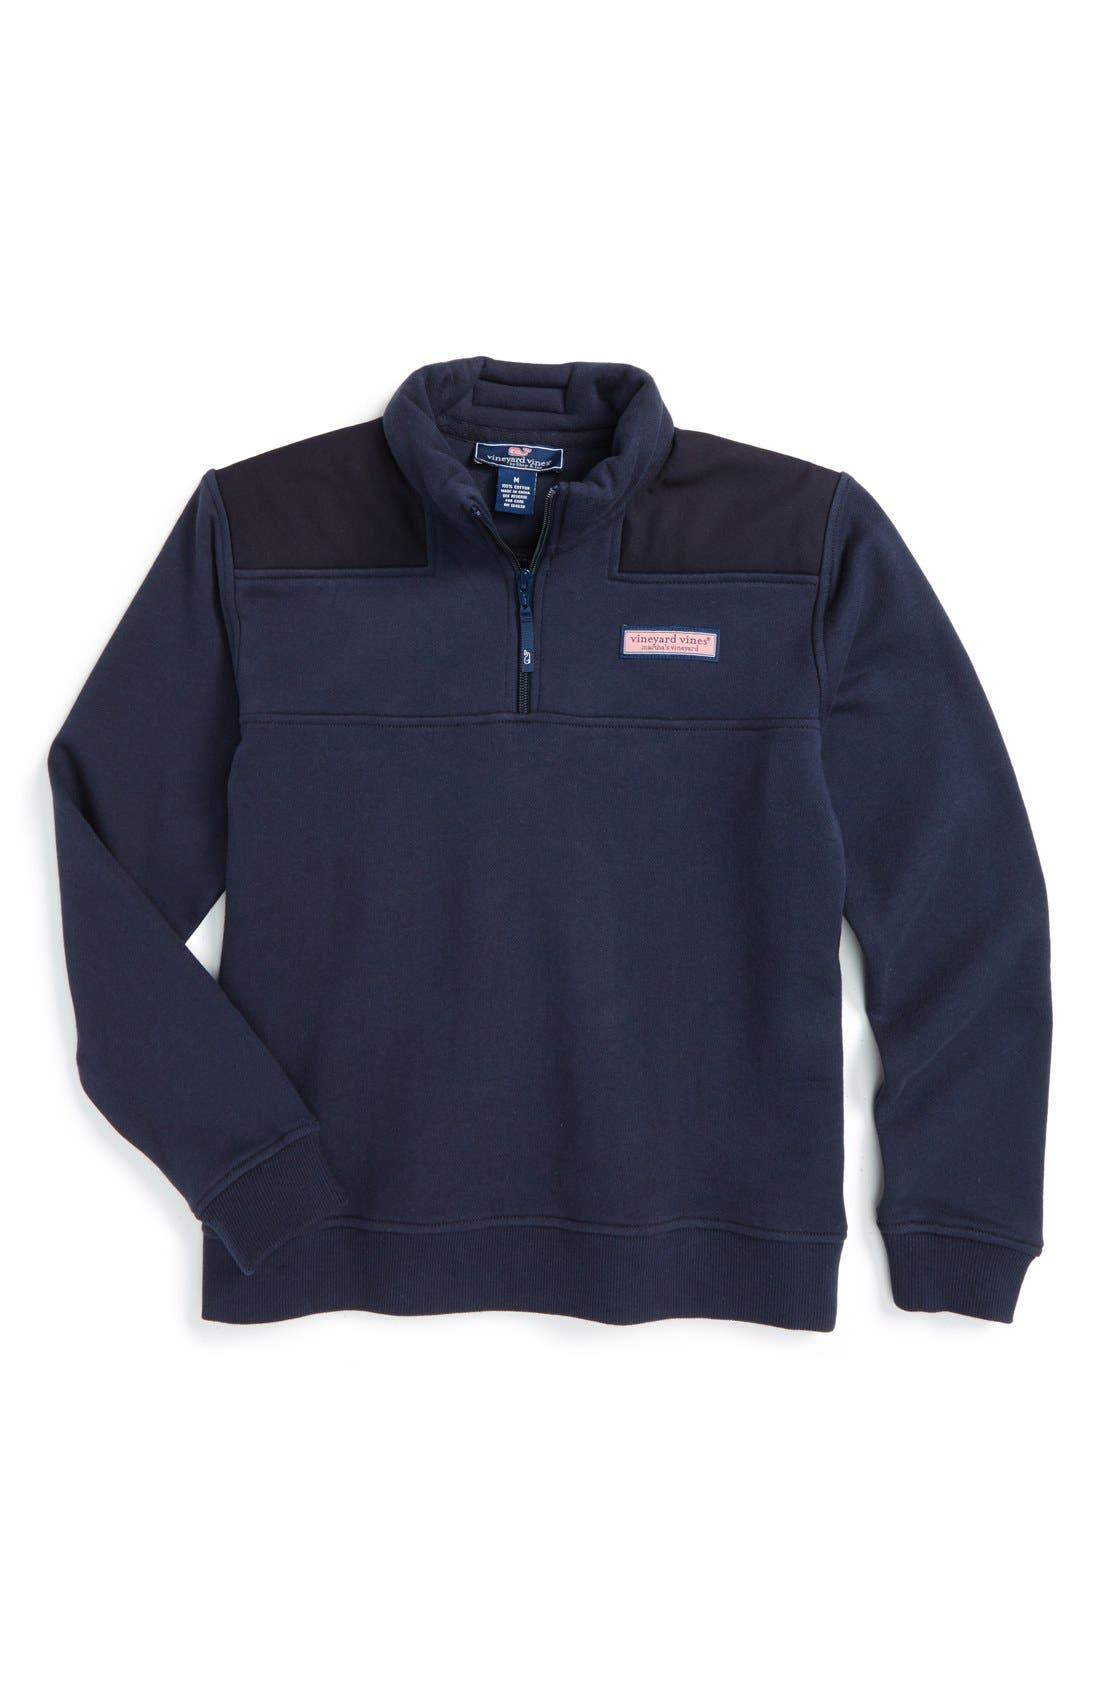 Vineyard Vines 'Shep' Quarter Zip Pullover Sweatshirt (Big Boys)